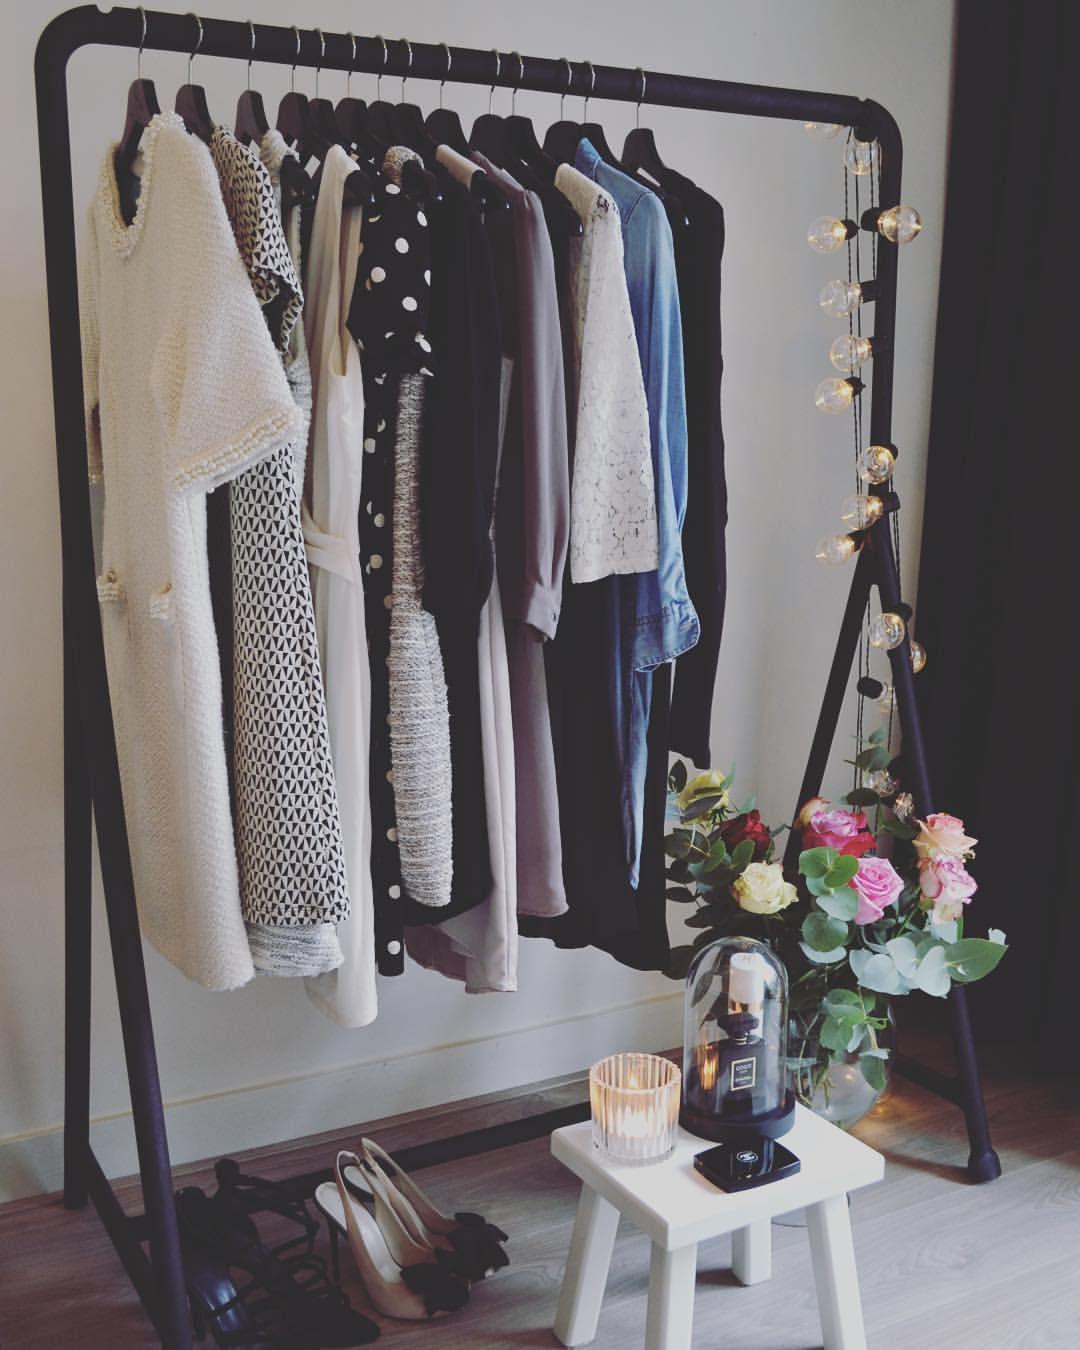 Pin de Janet Dang en Closet & Vanity   Pinterest   Armario, Entrada ...